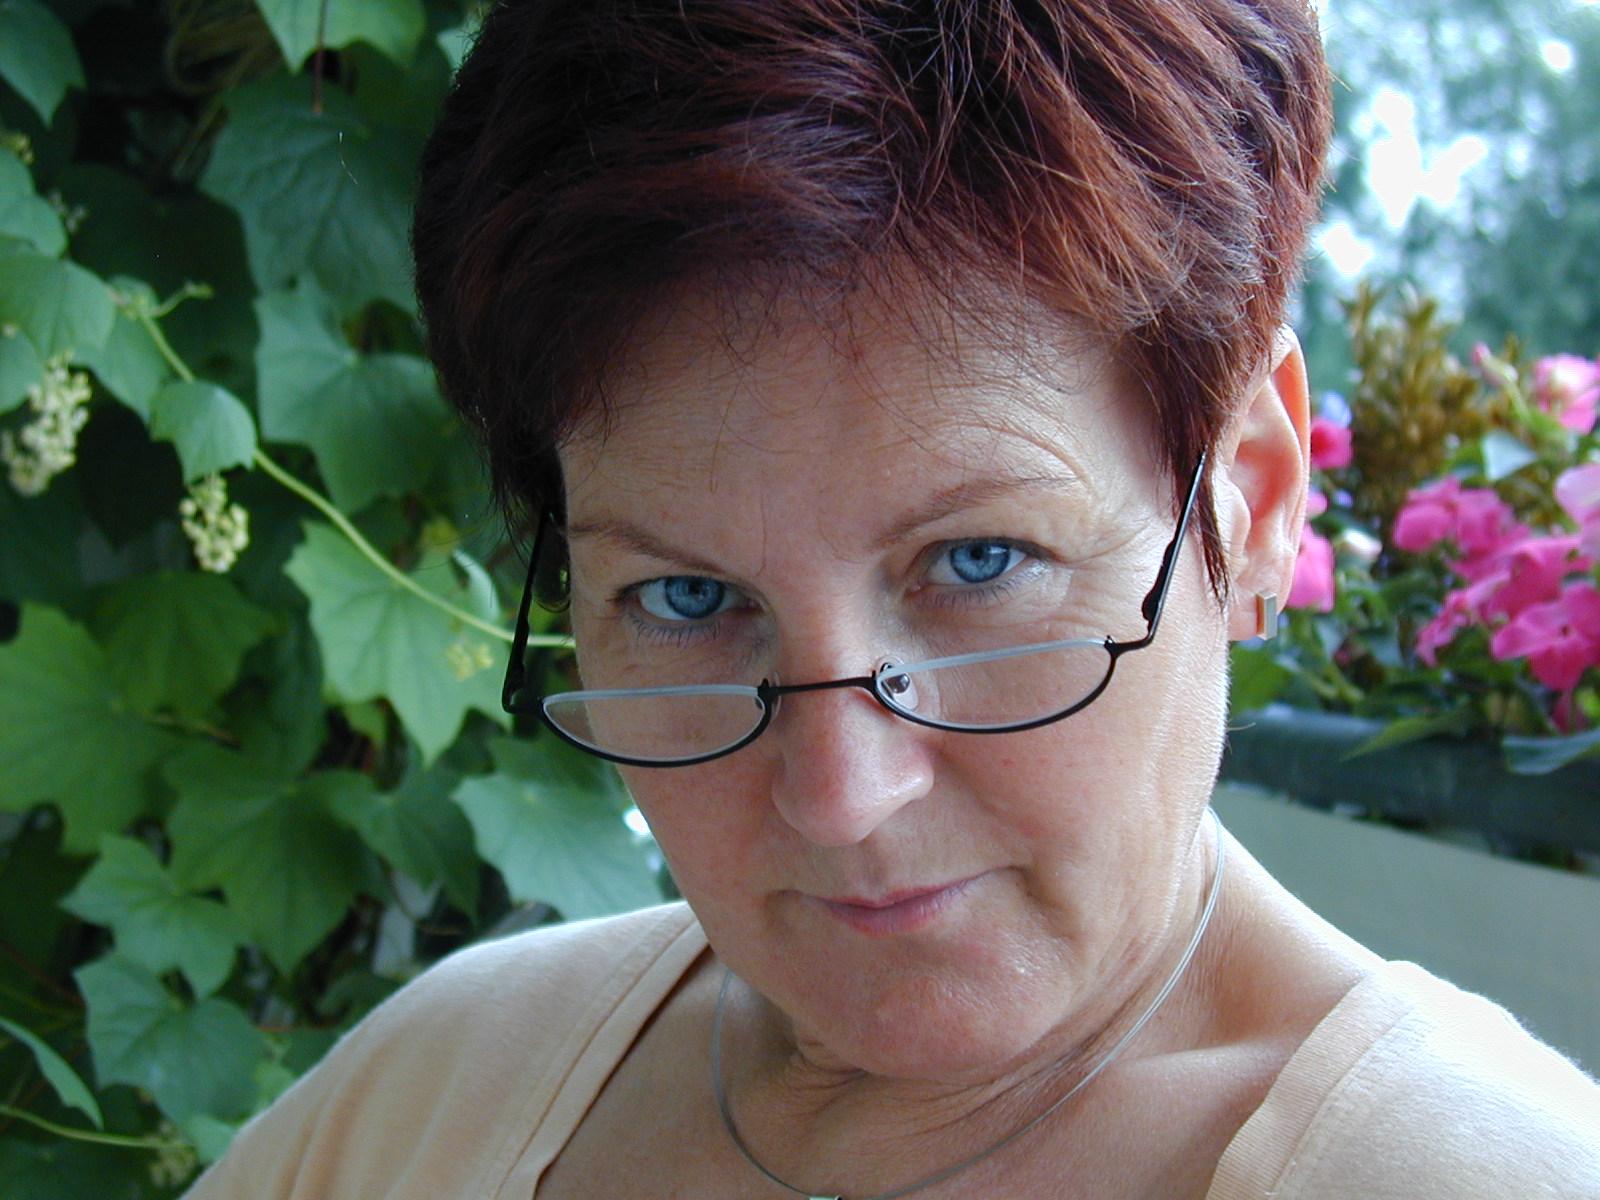 menopausia-importancia-nutricion-menopausia